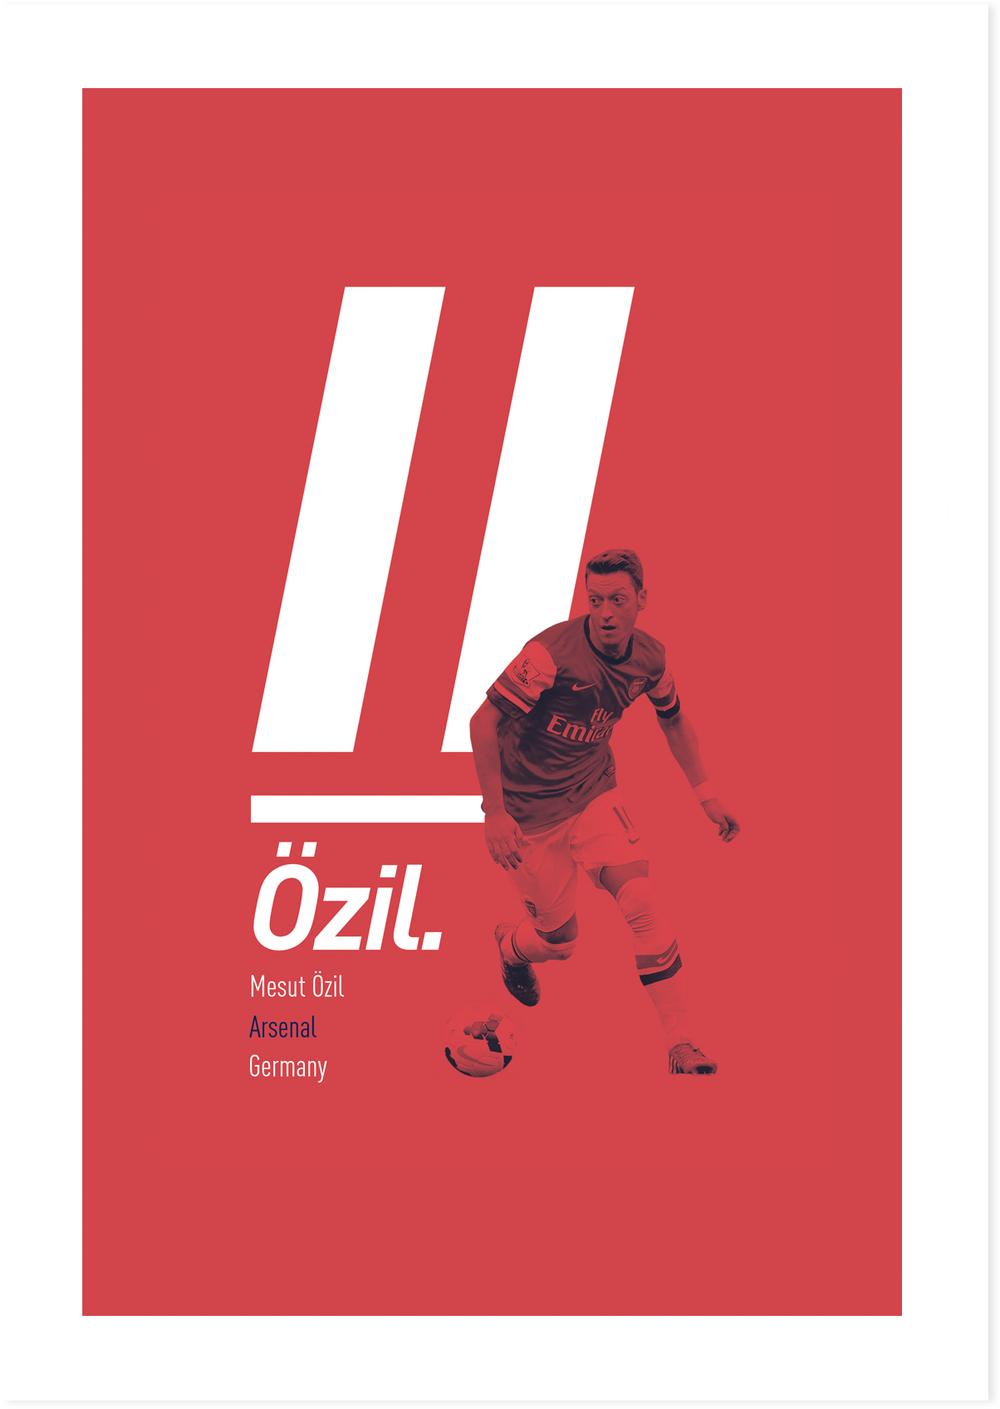 Ozil_web.jpg